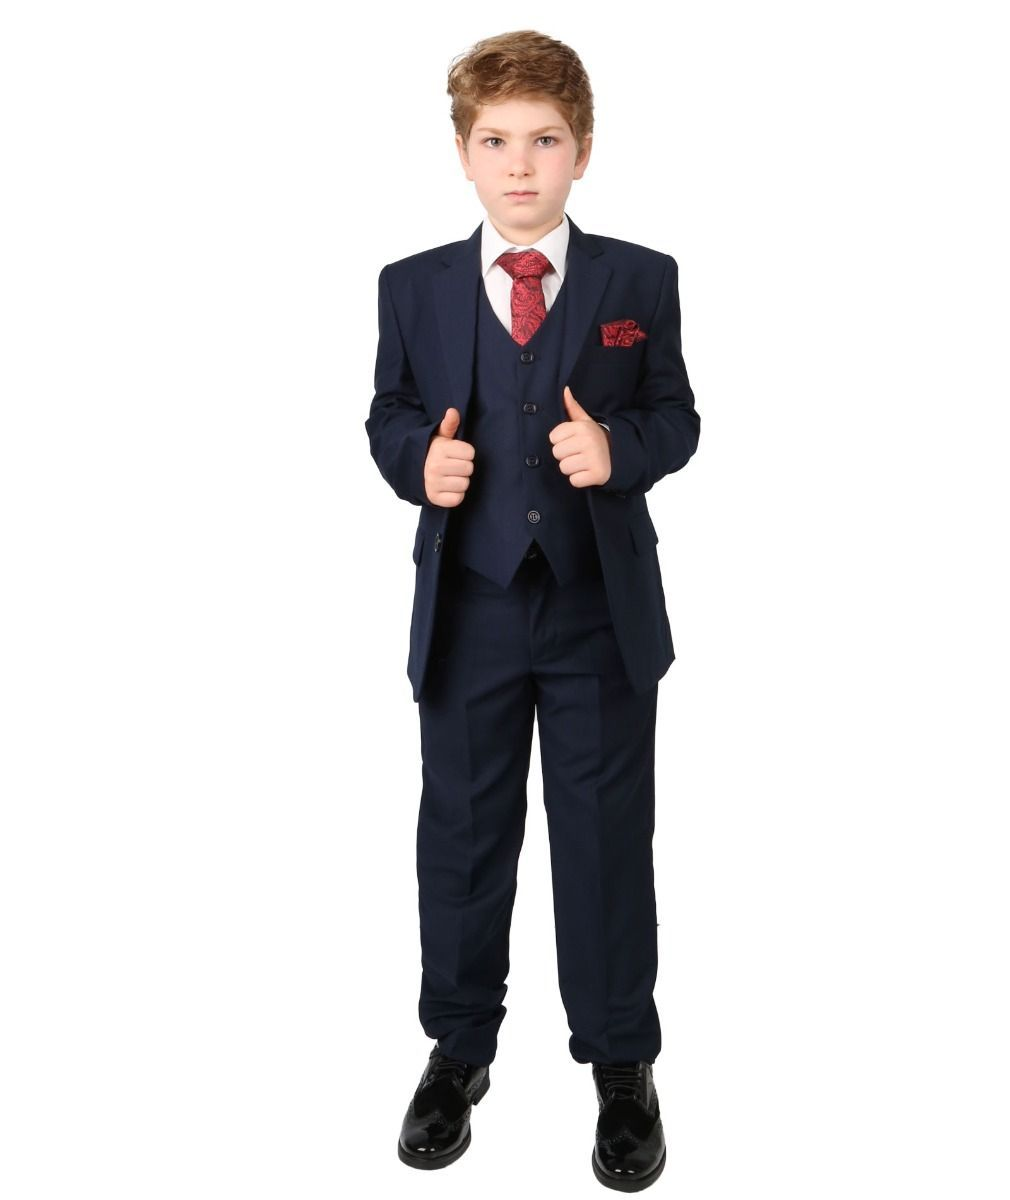 Designer Sebastian Le Blanc Boys Grey Slim Fit Suit Prince William Style